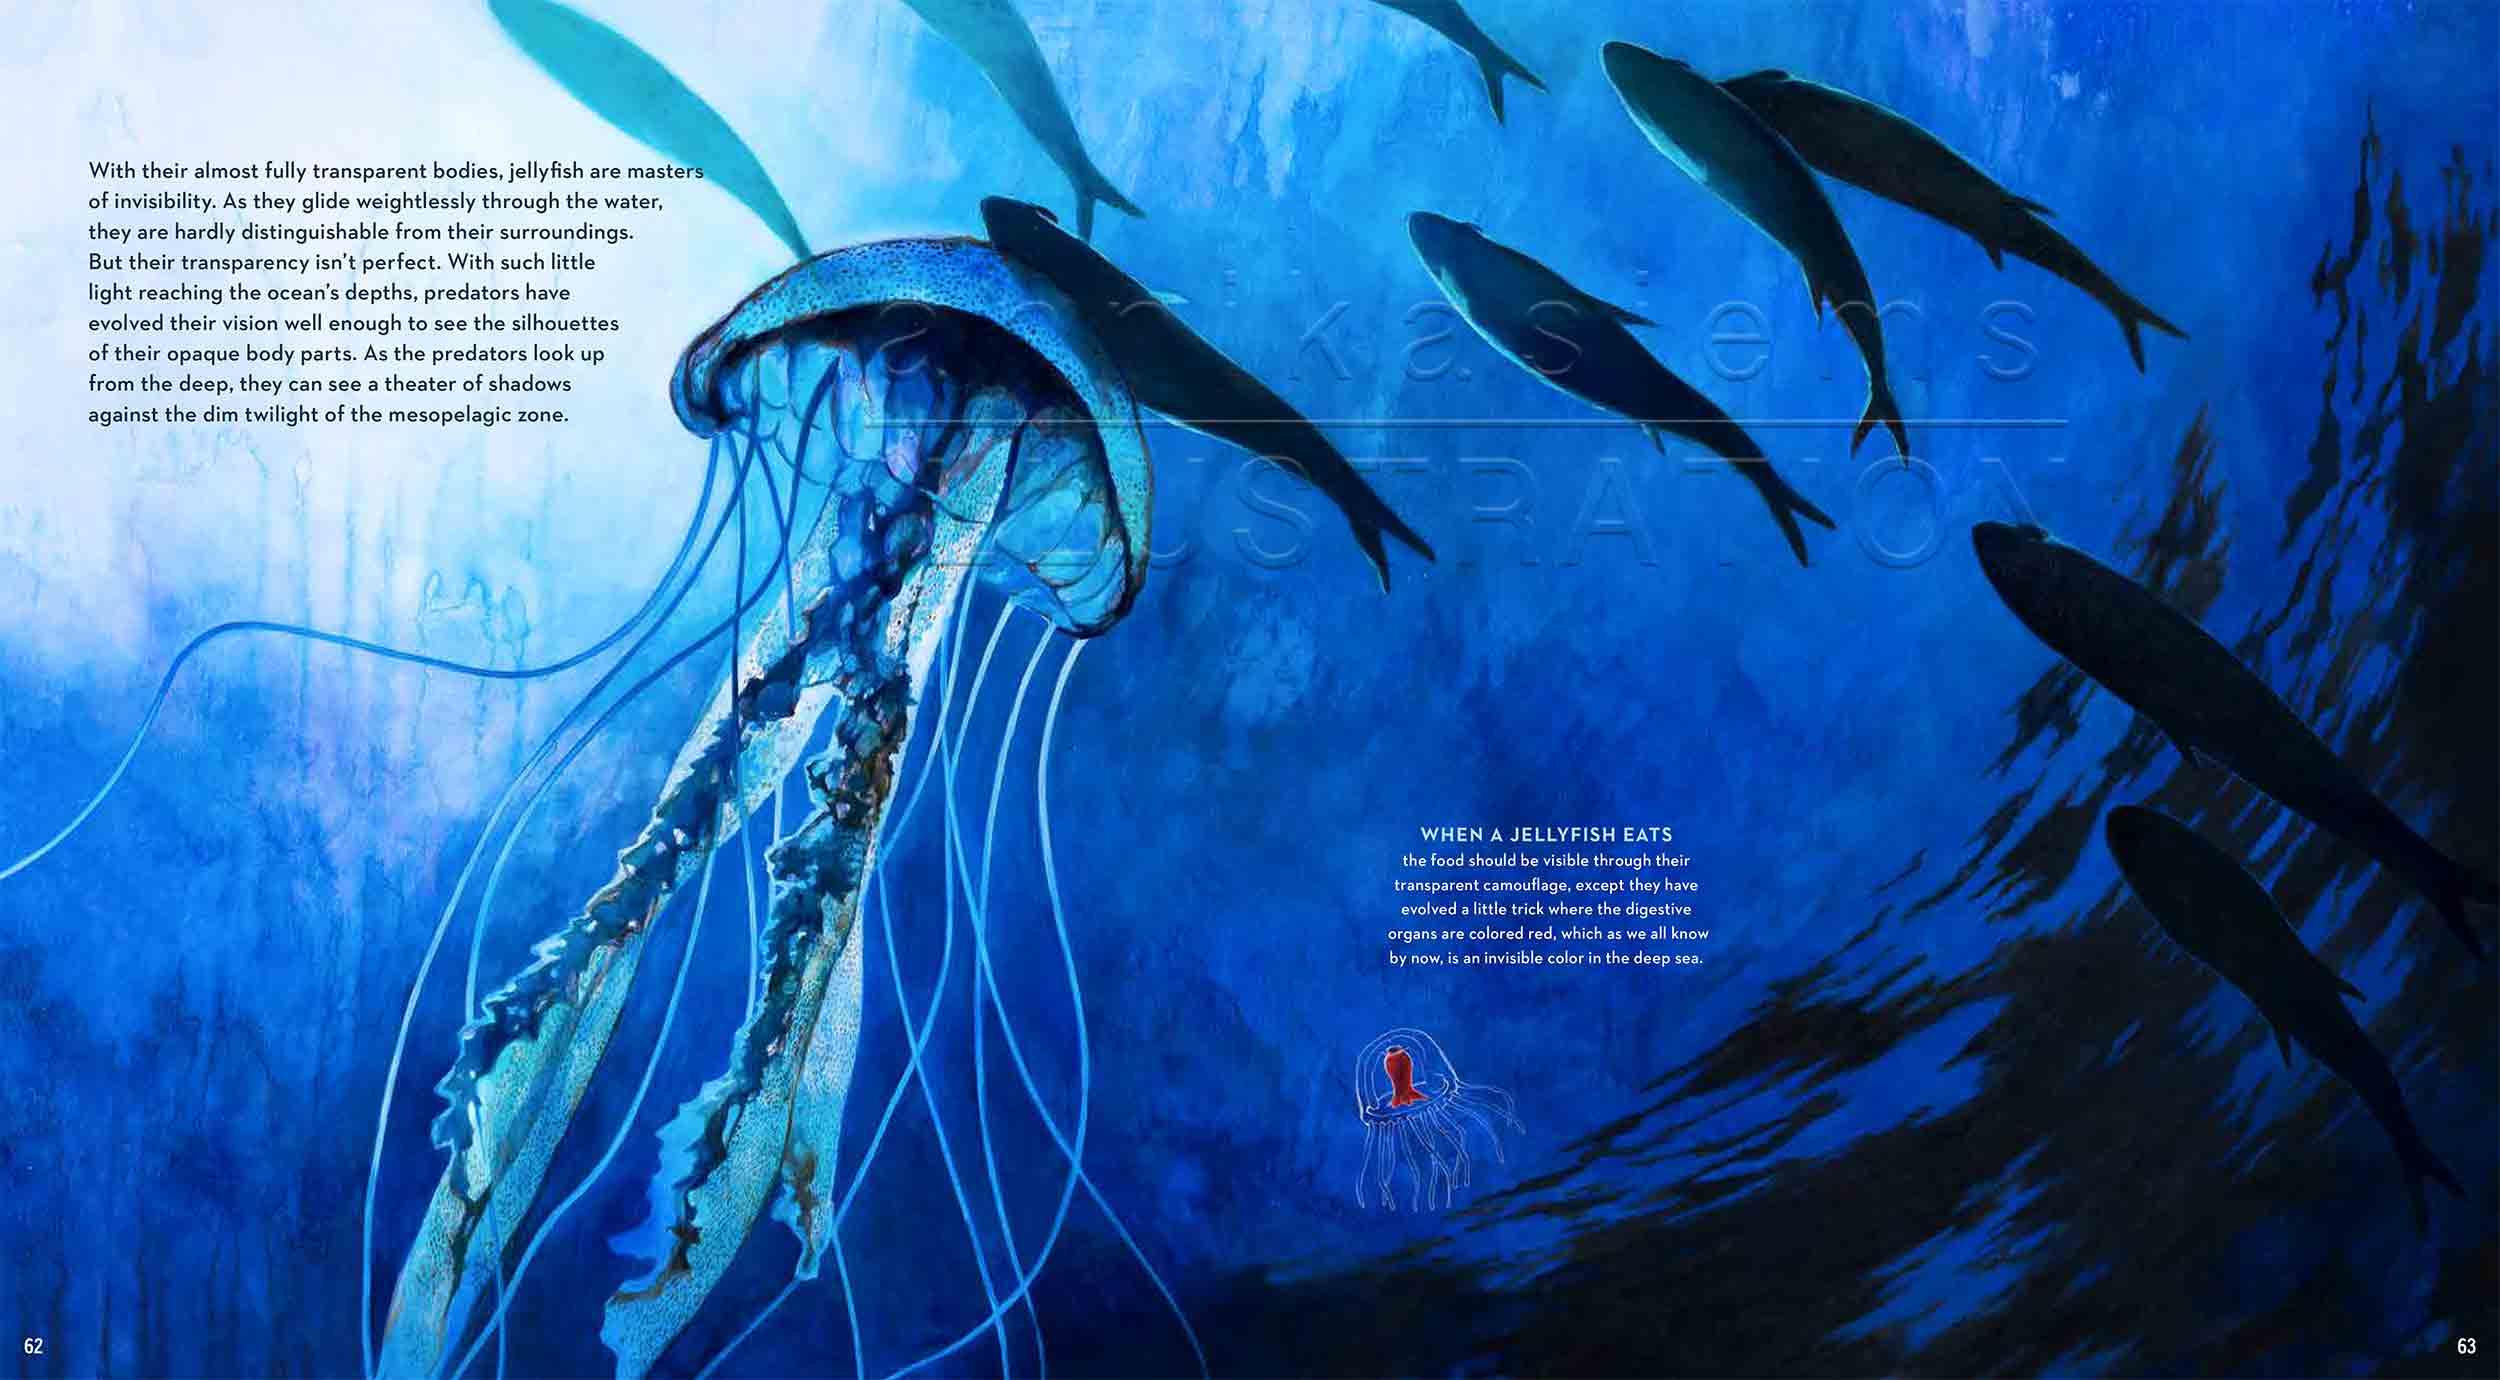 62-63Jellyfish-deep-sea-Englisch-submersible-©annikasiems-plankton_deepsea-zooplankton.jpg